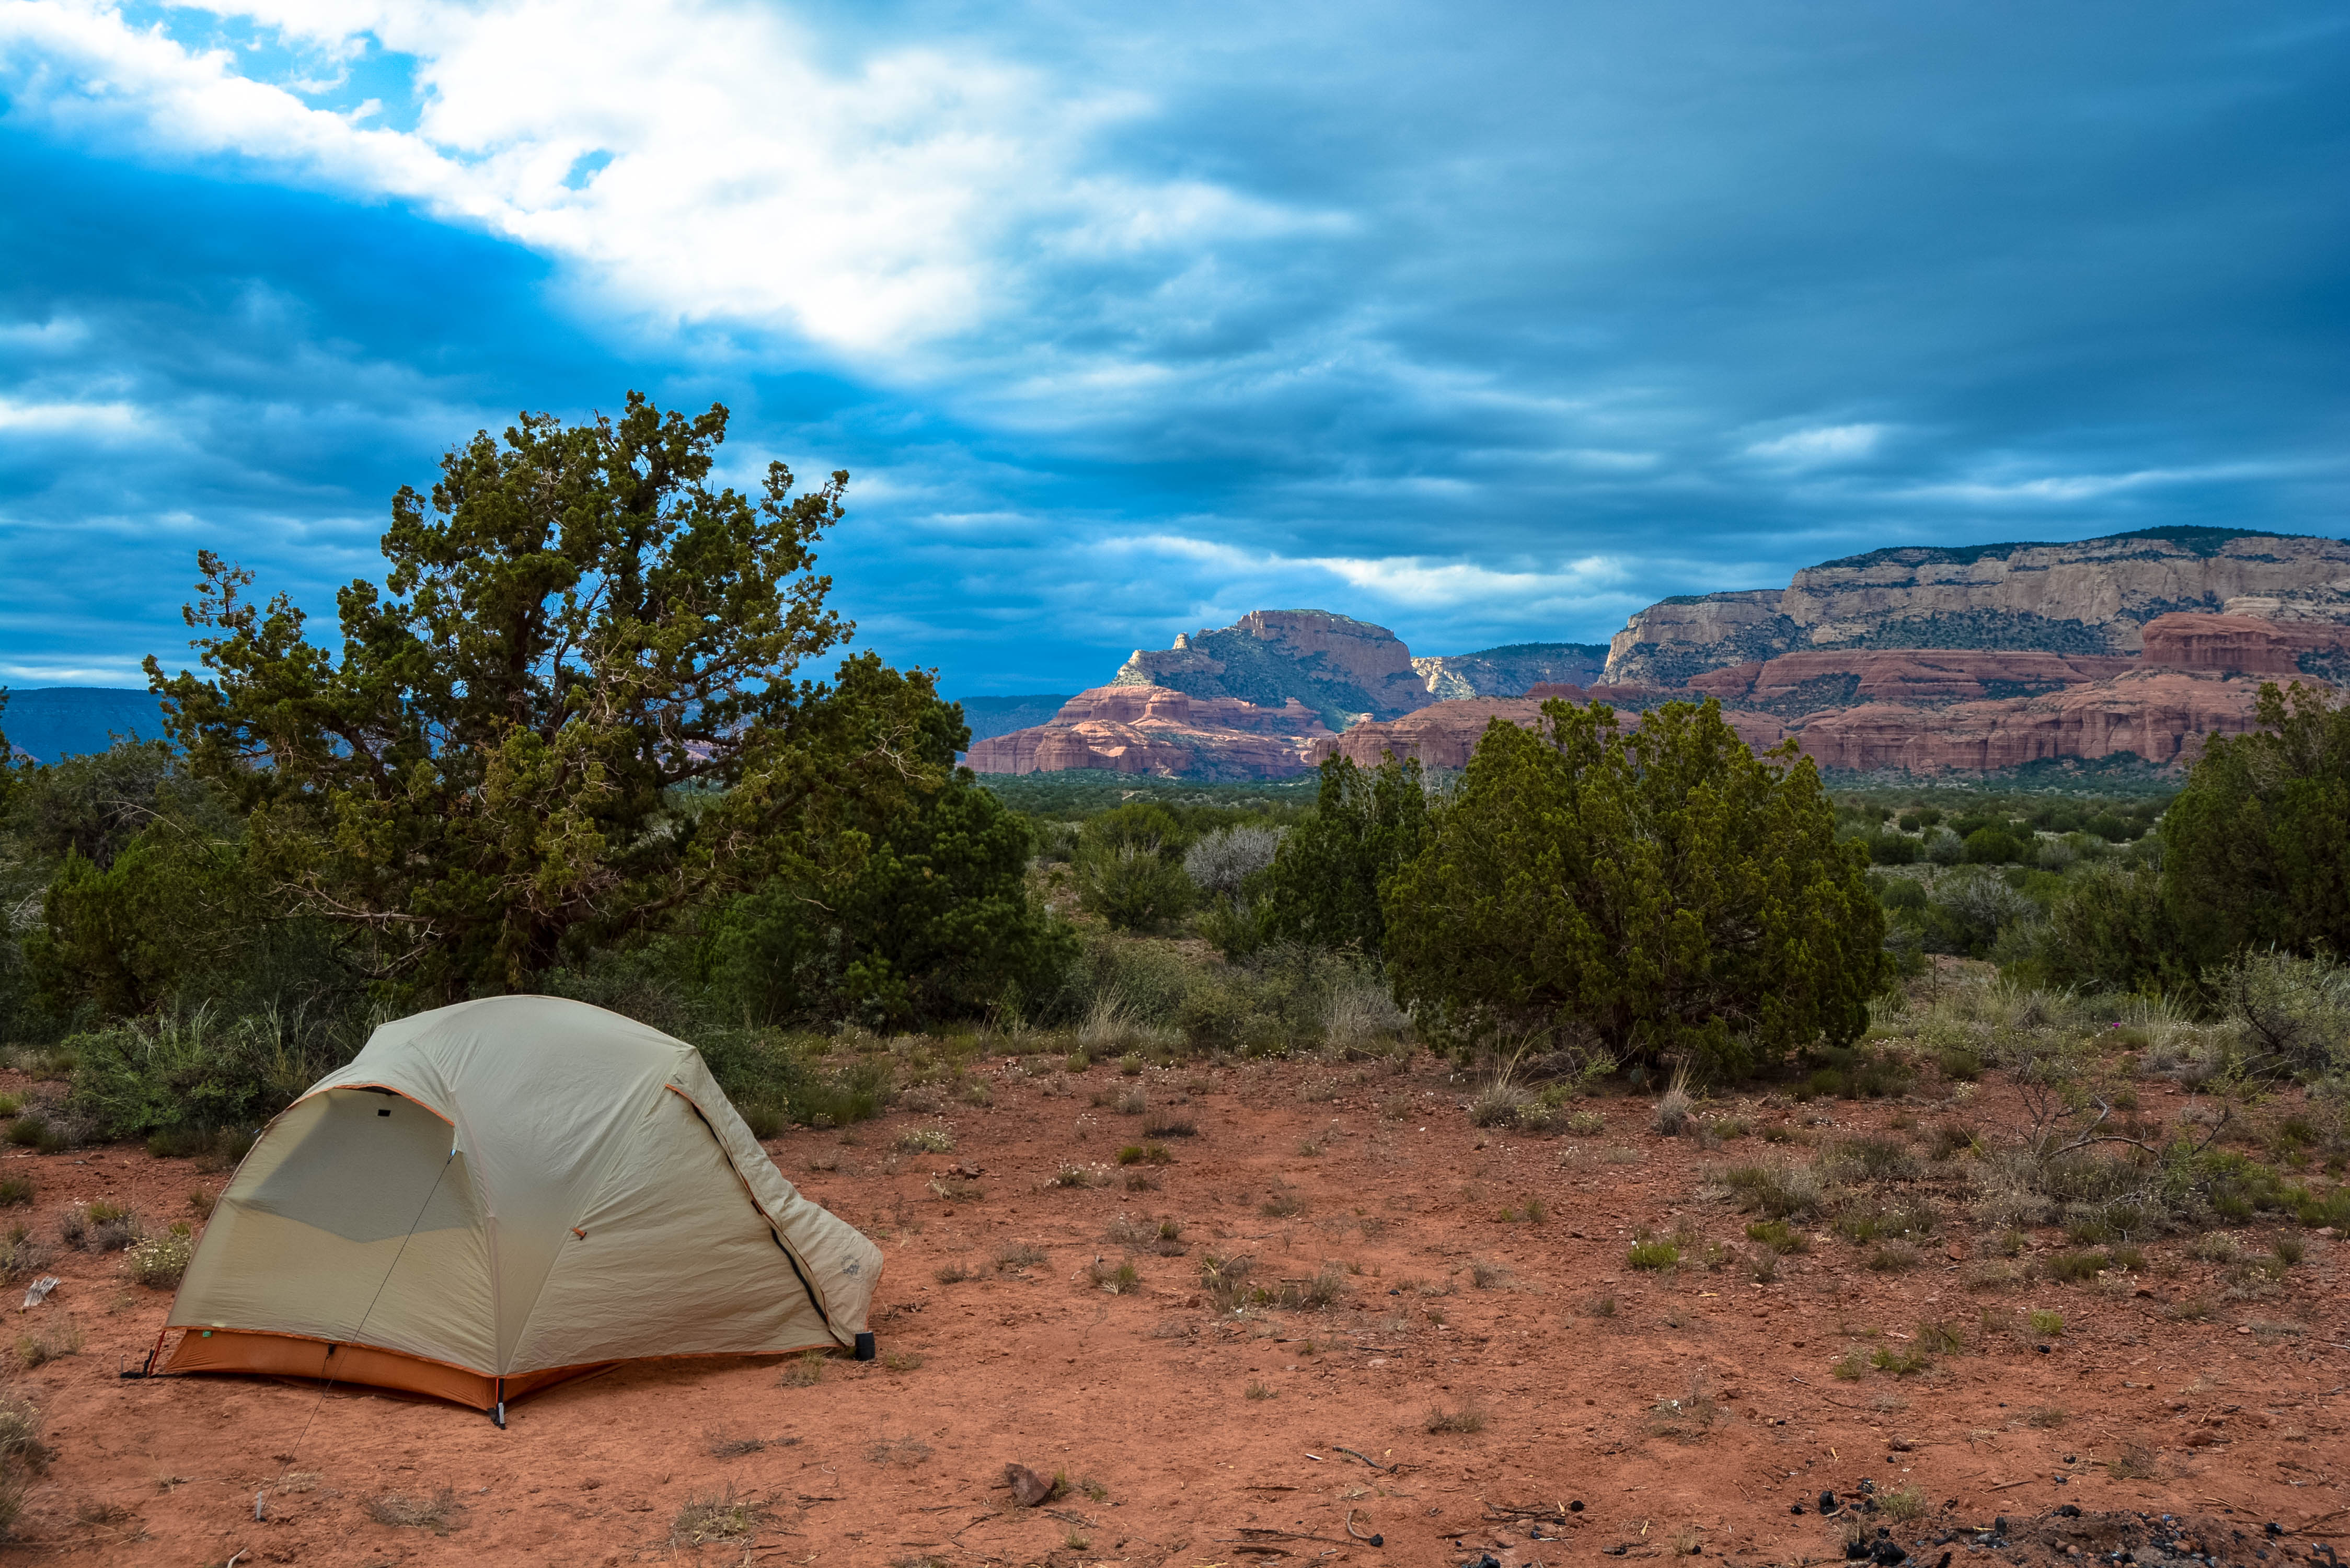 Camping in Sedona